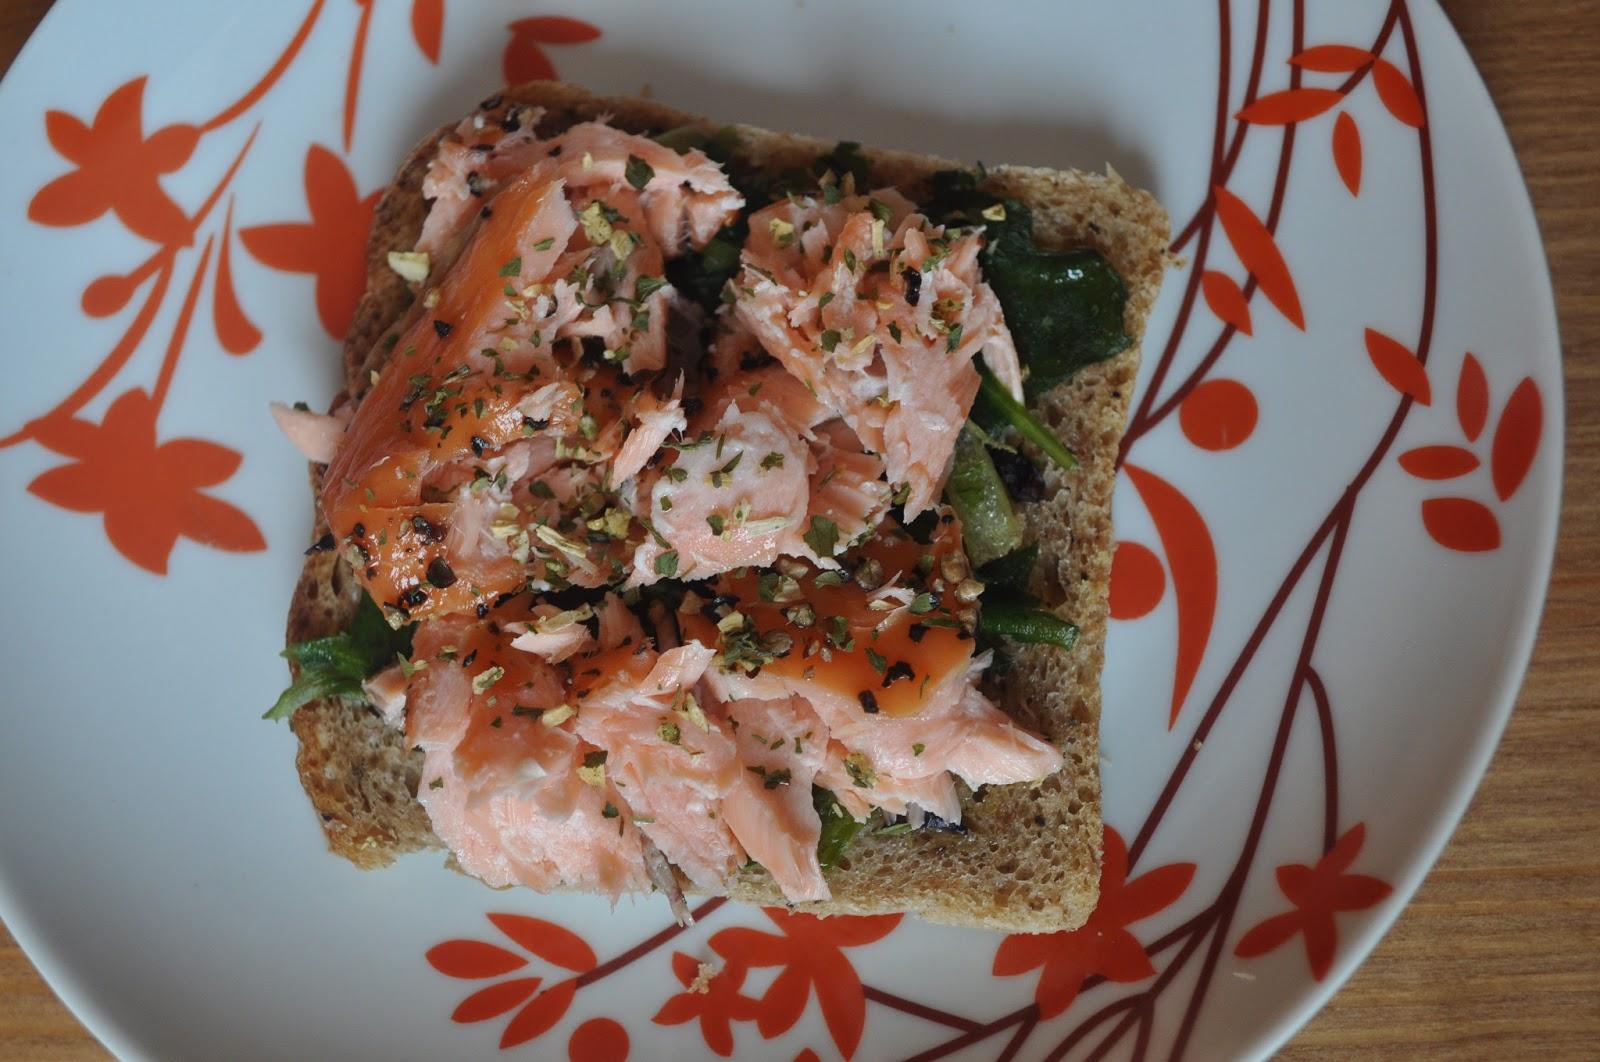 Pomysł na śniadanie – kanapka z łososiem